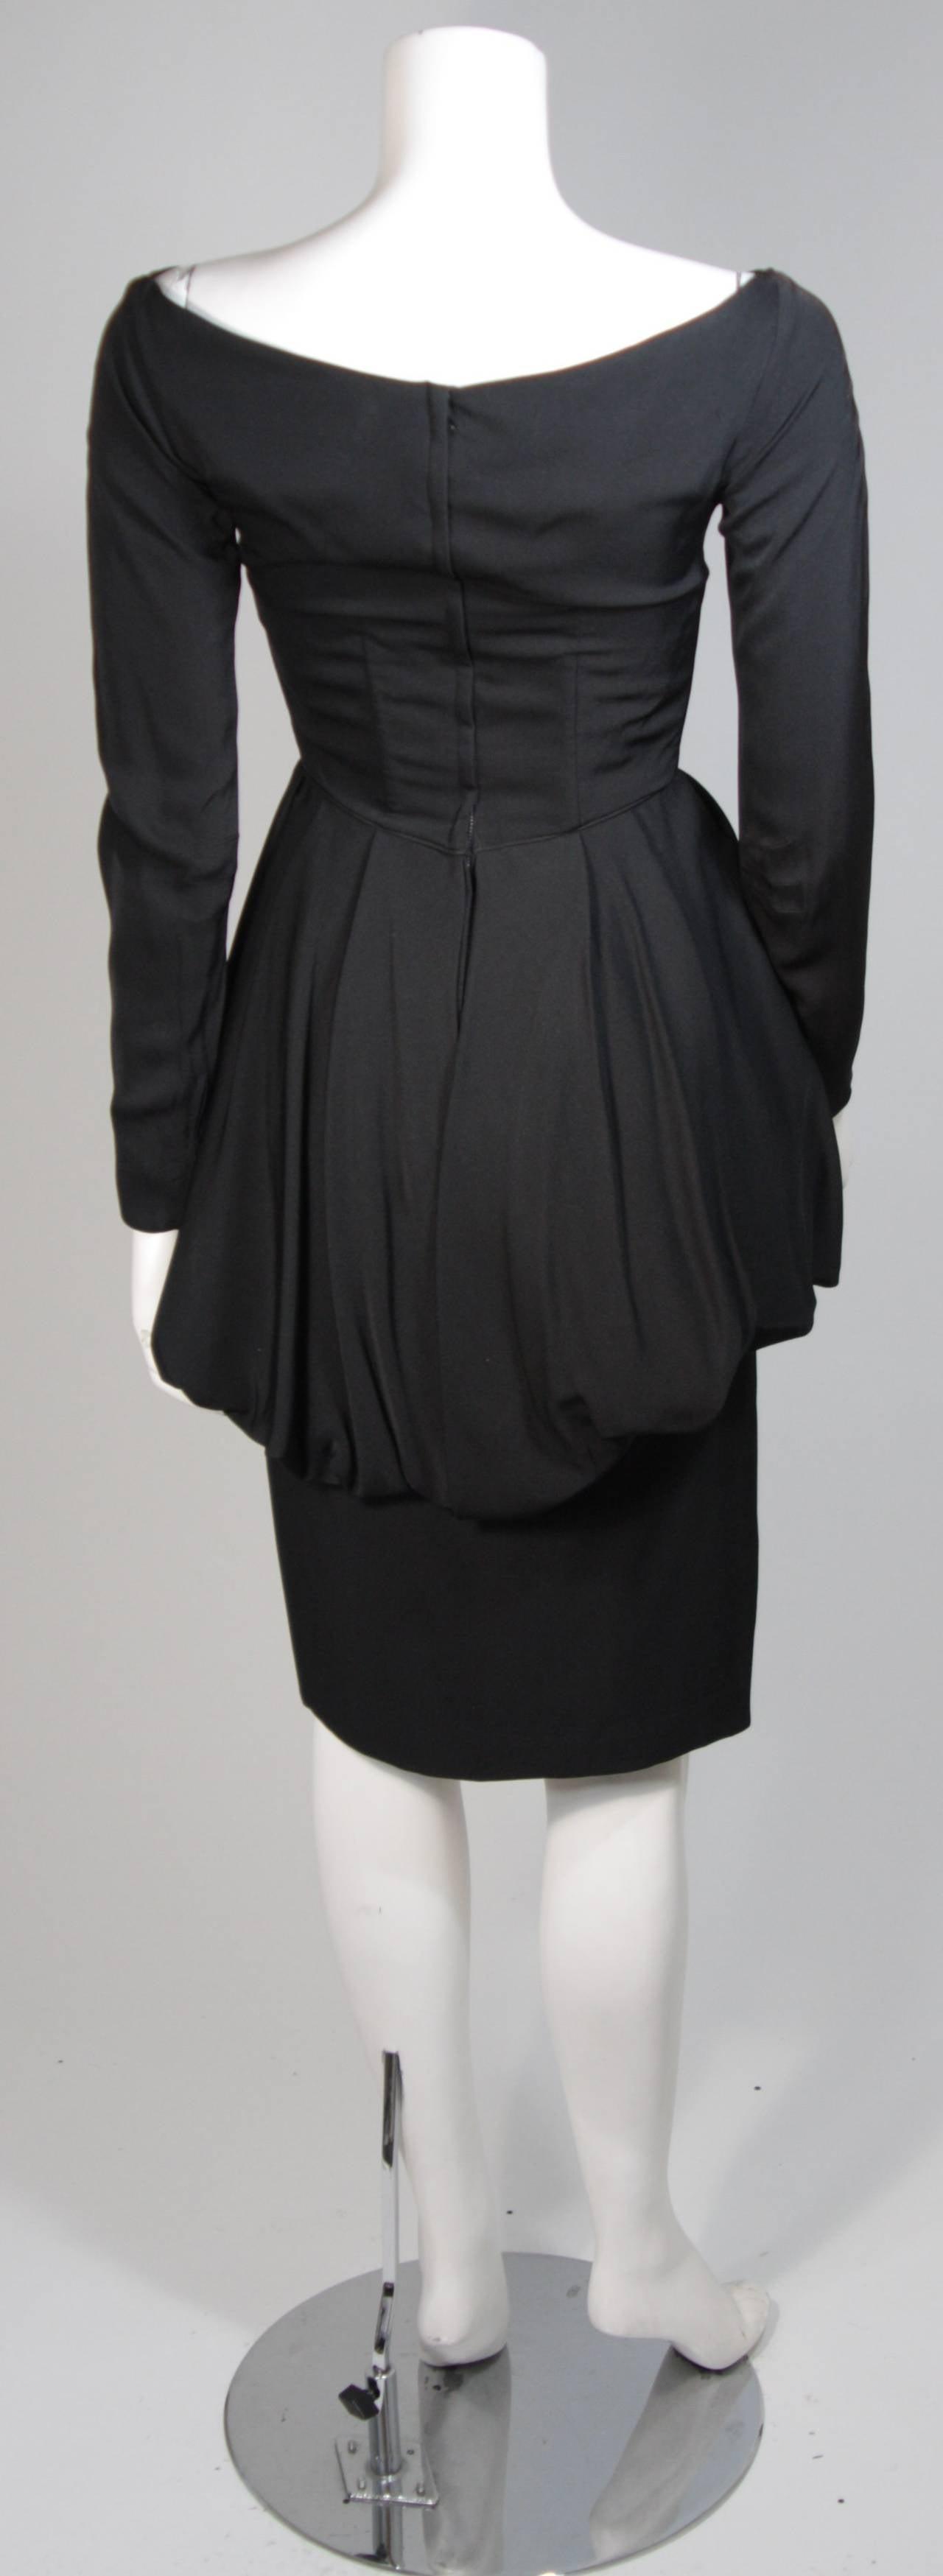 Ceil Chapman Black Draped Princess Seam Peplum Style Waist Dress Size XS 9